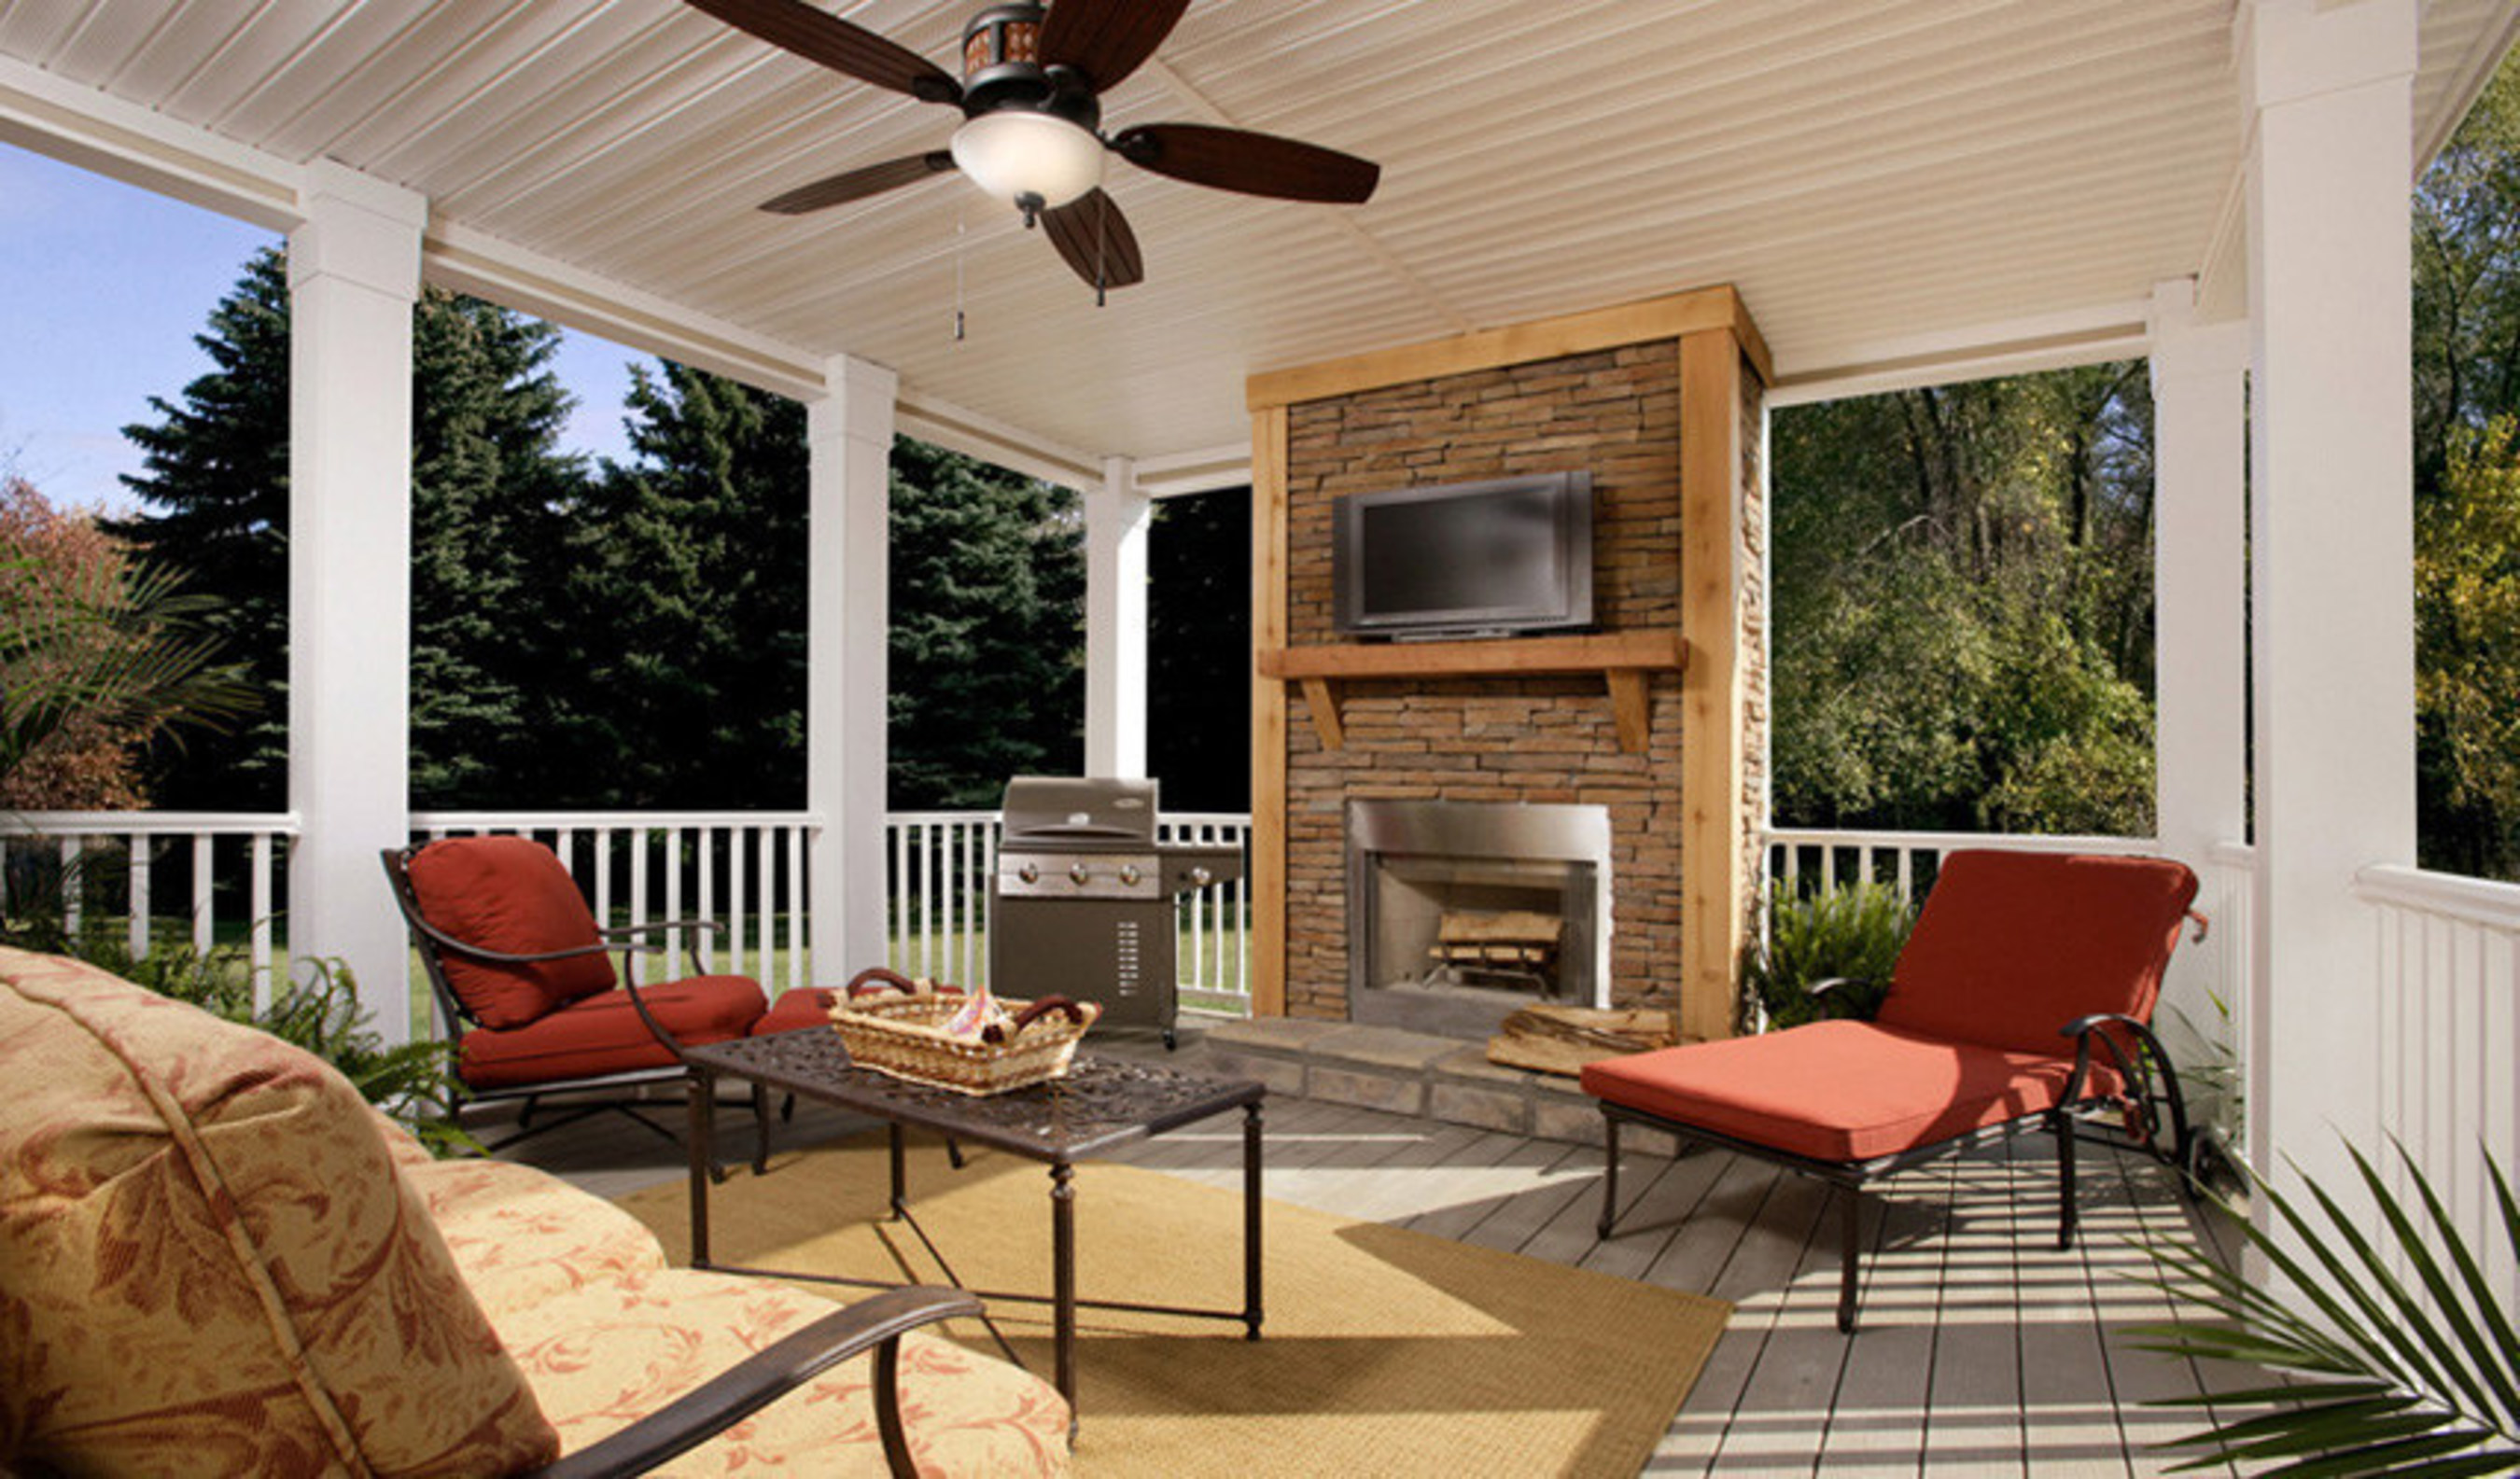 Clayton homes reveals top outdoor living spaces for summer - Outdoor living spaces with fireplace ...